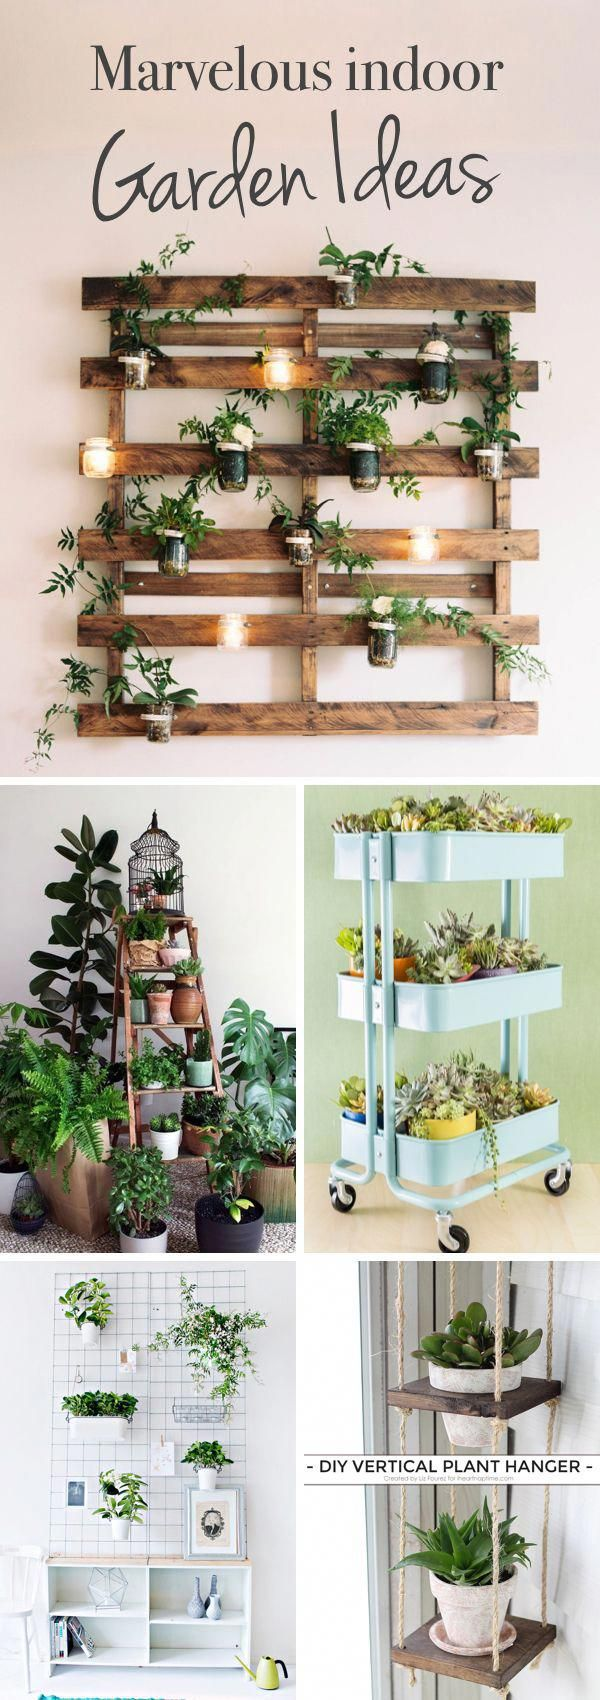 Marvelous Indoor Garden Ideas Combating Lack of Space or Harsh